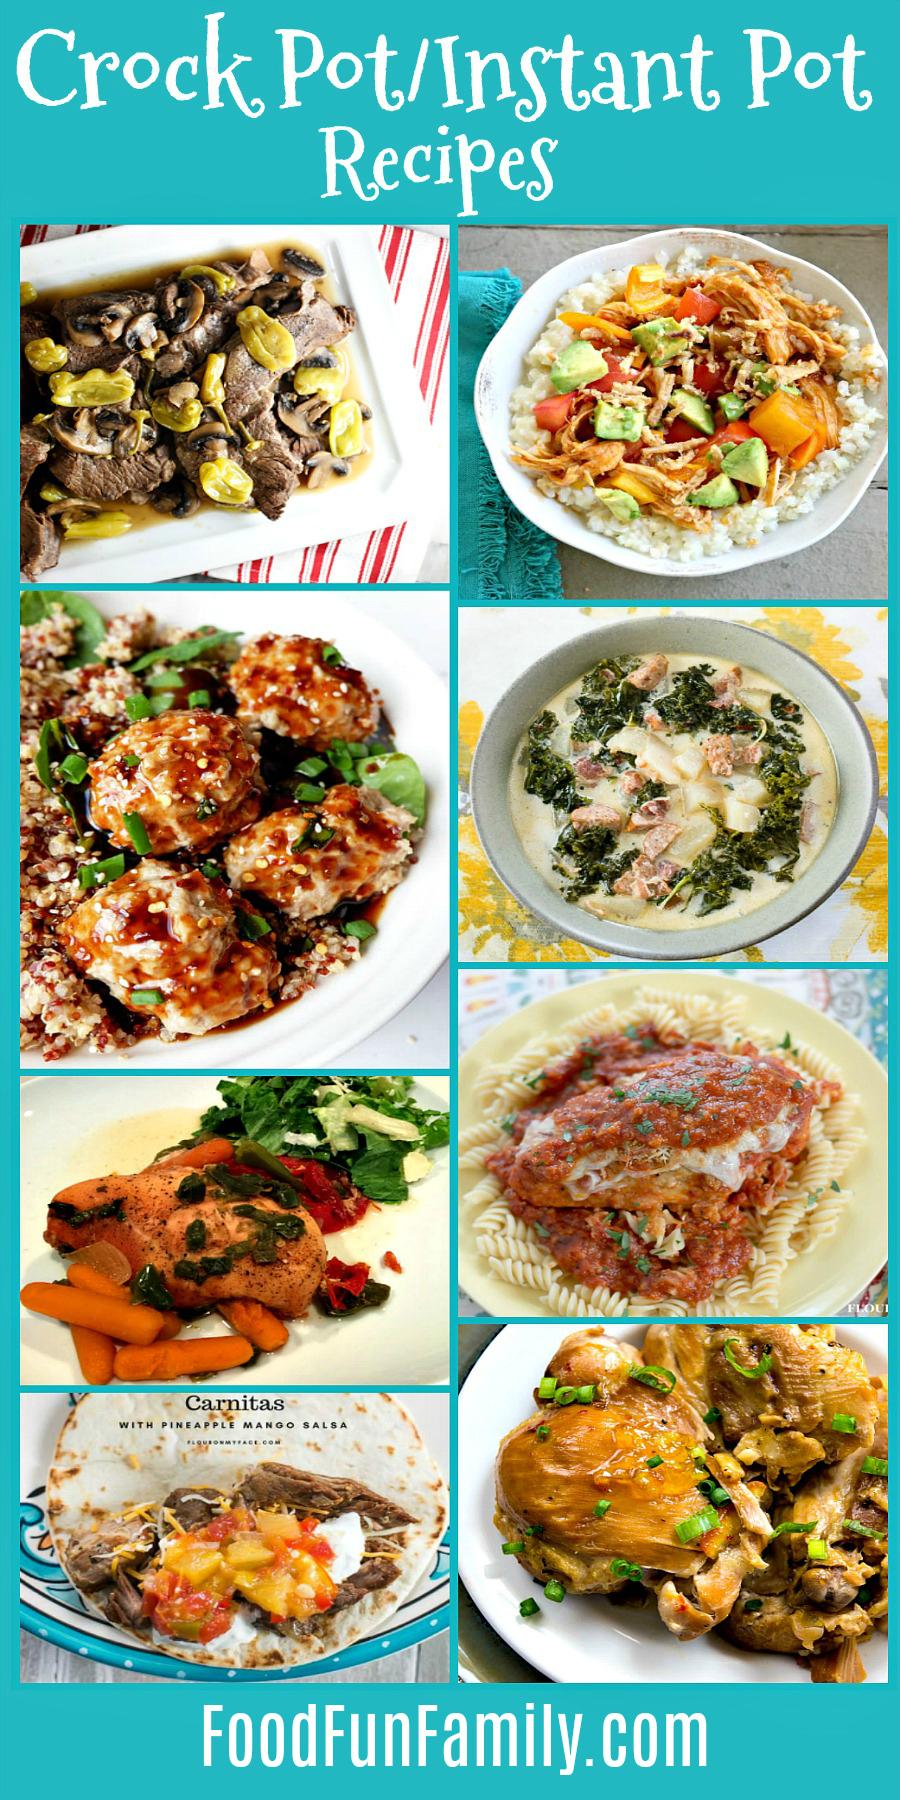 Crock Pot and Instant Pot Recipes Delicious Dishes Recipe Party